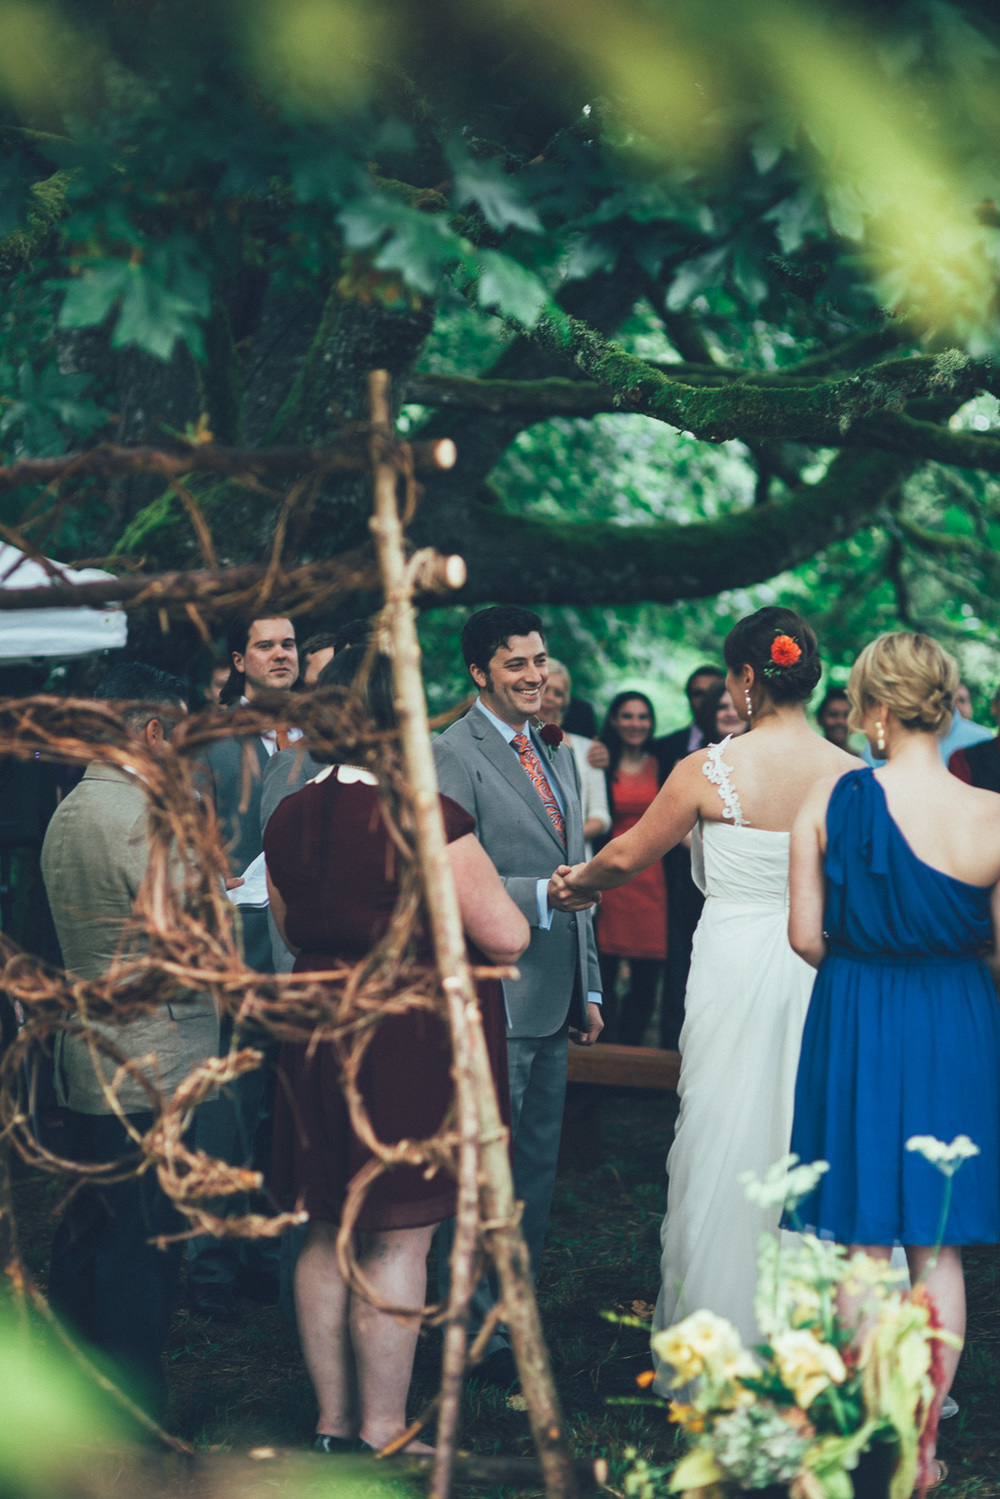 vashon_island_wedding_lennon_marissa-4237.jpg